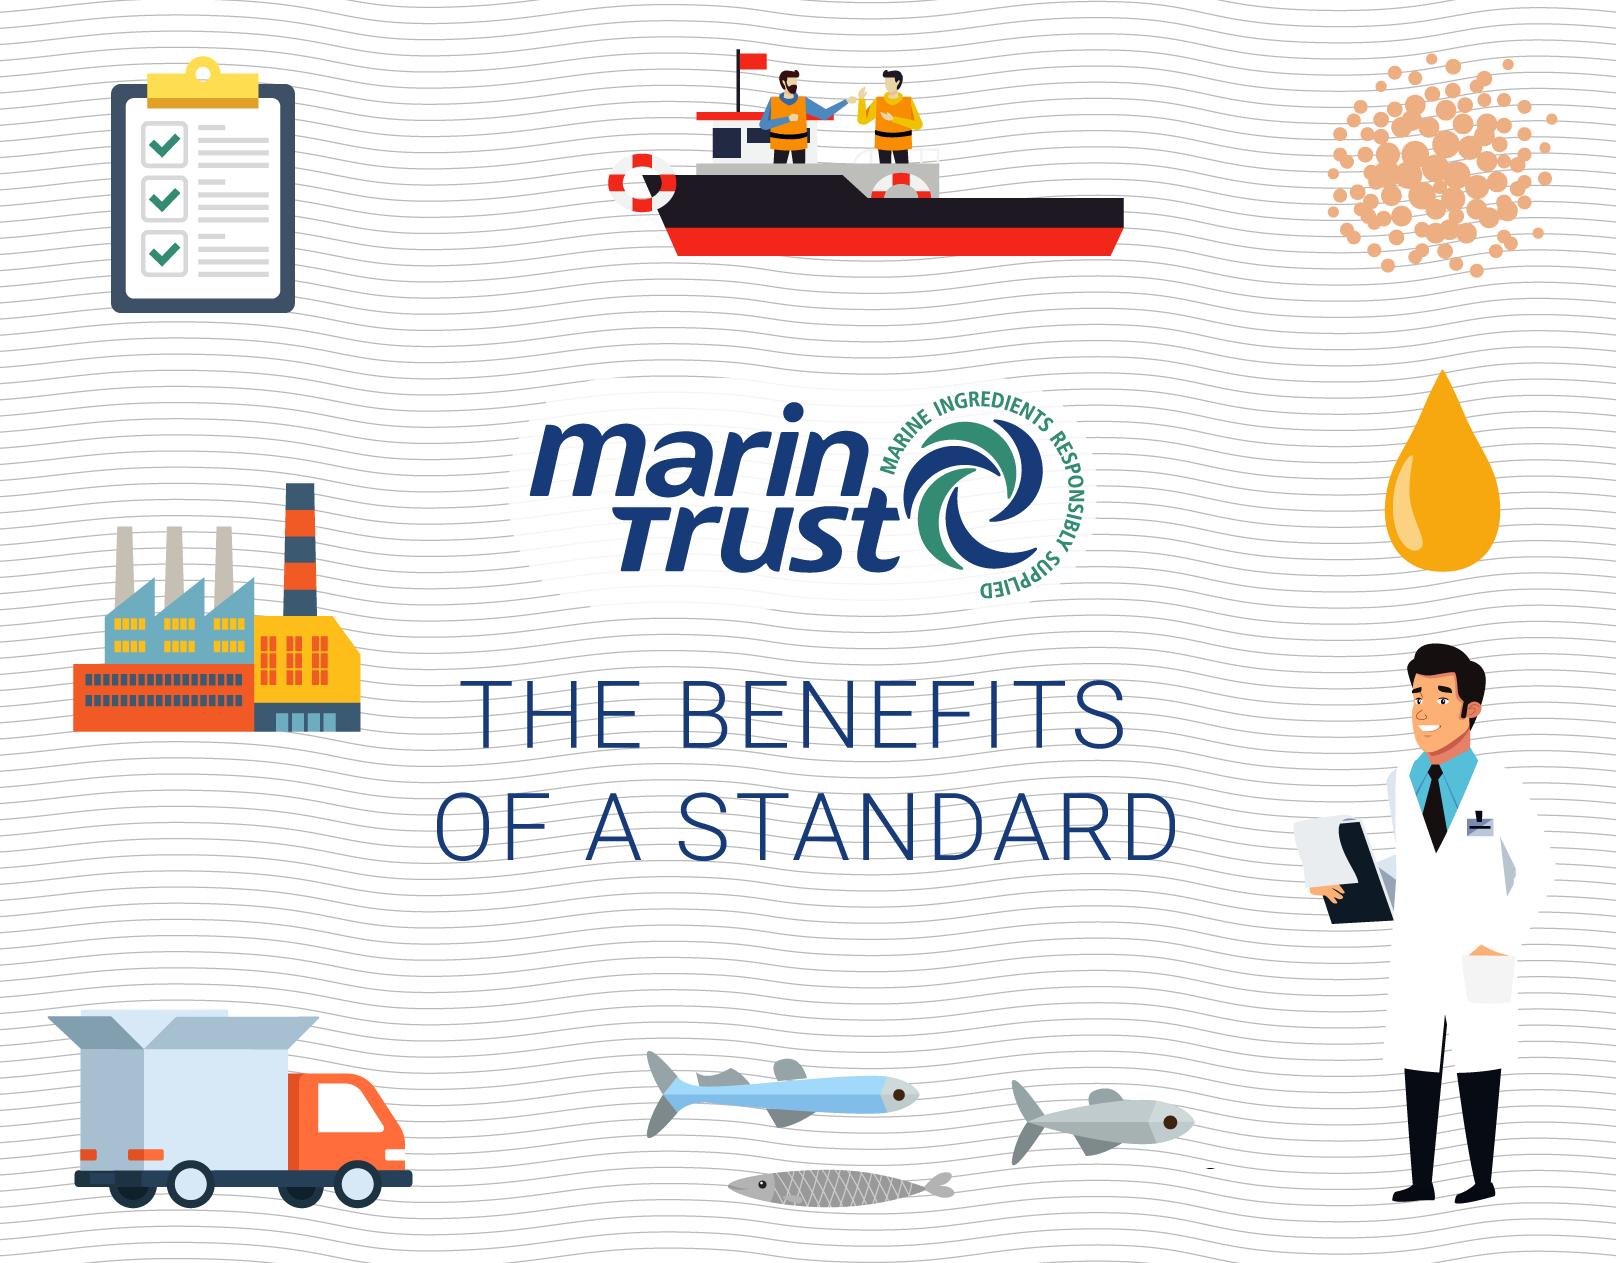 MarinTrust-The-Benefits-of-a-Standard-Animation